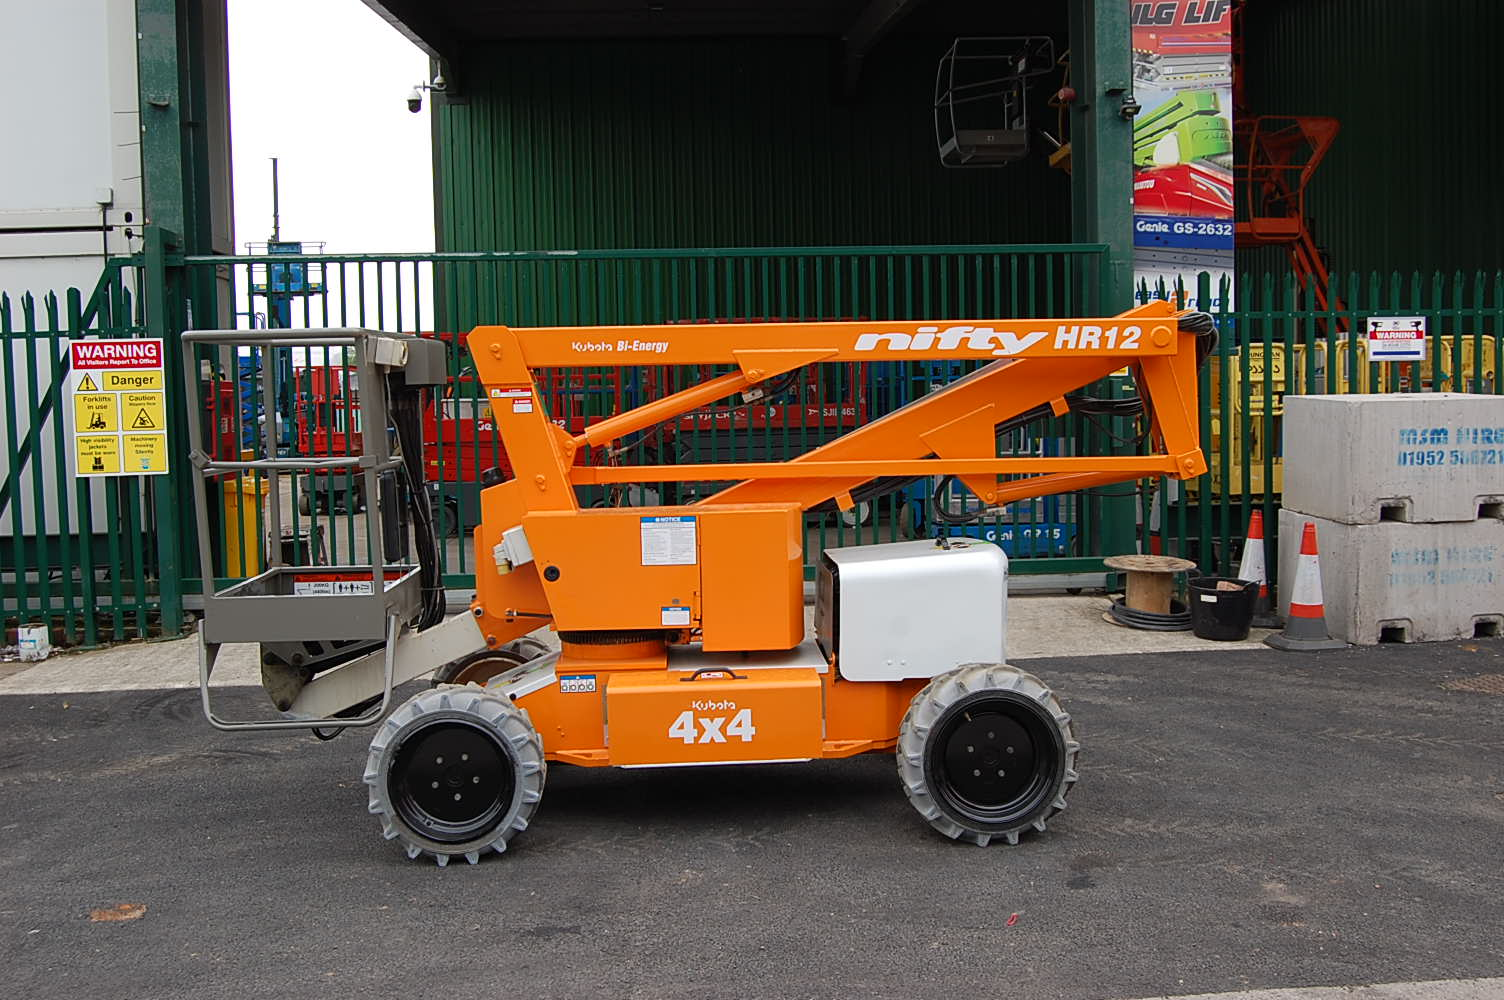 Niftylift HR12 DE 4×4 Bi Energy Boom Lift